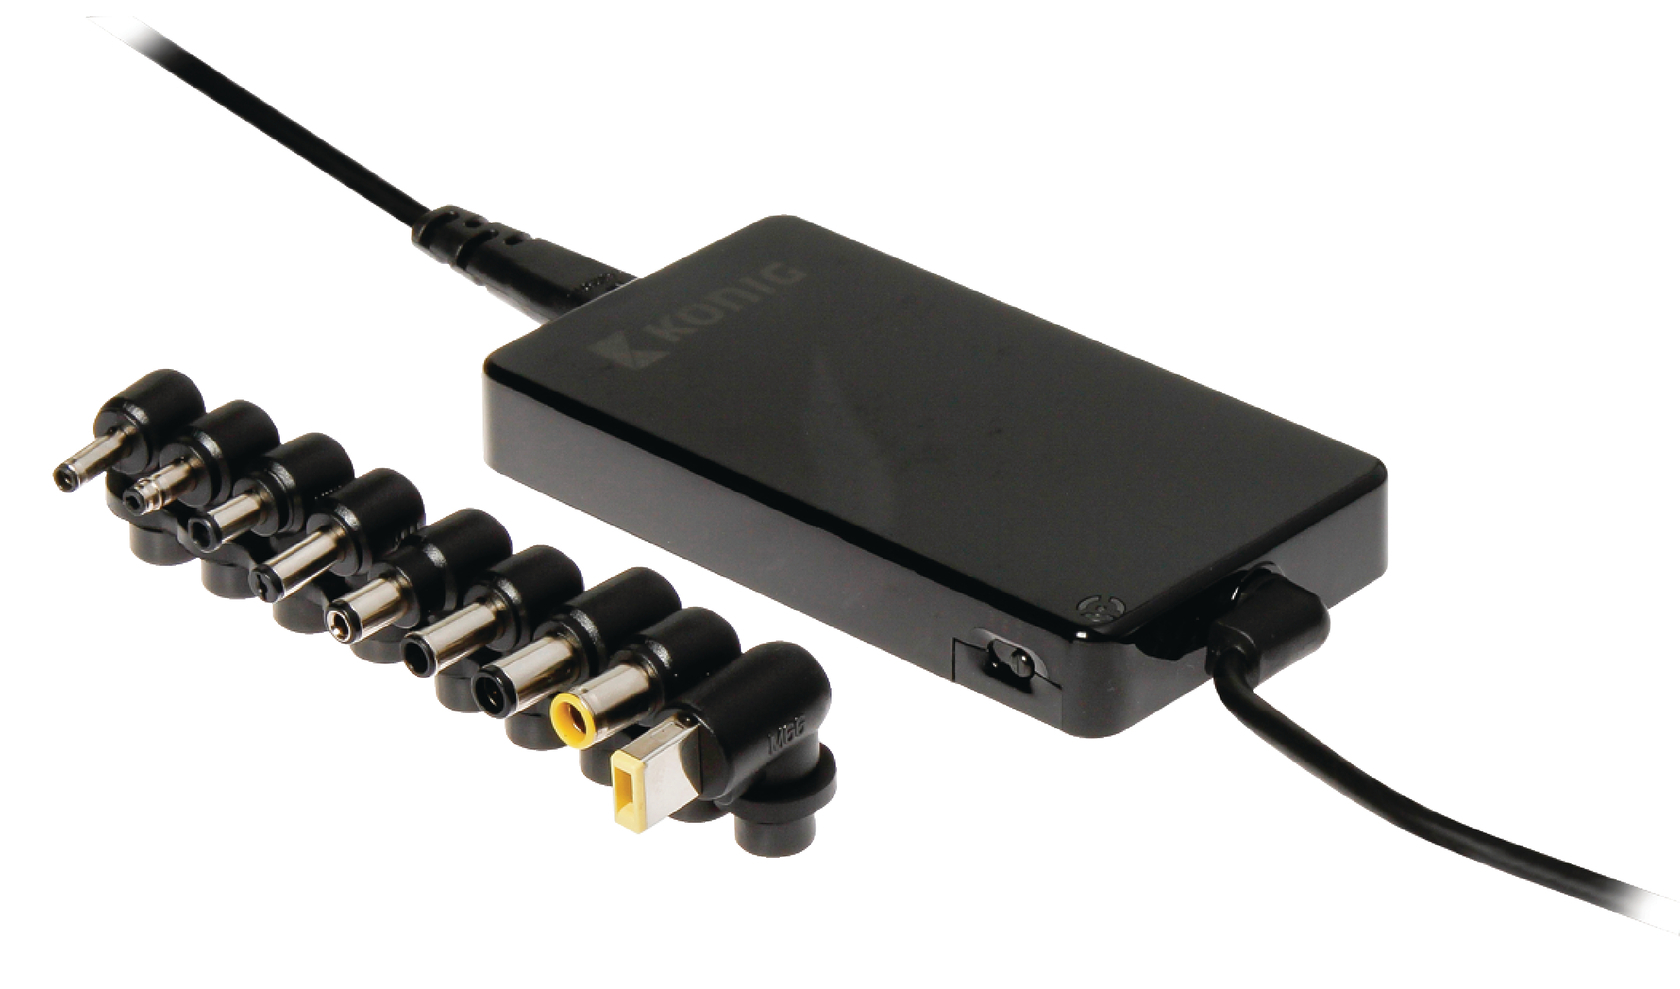 Konig Universele notebook-adapter slank 90 W met USB-poort (CSUNA90SBL)